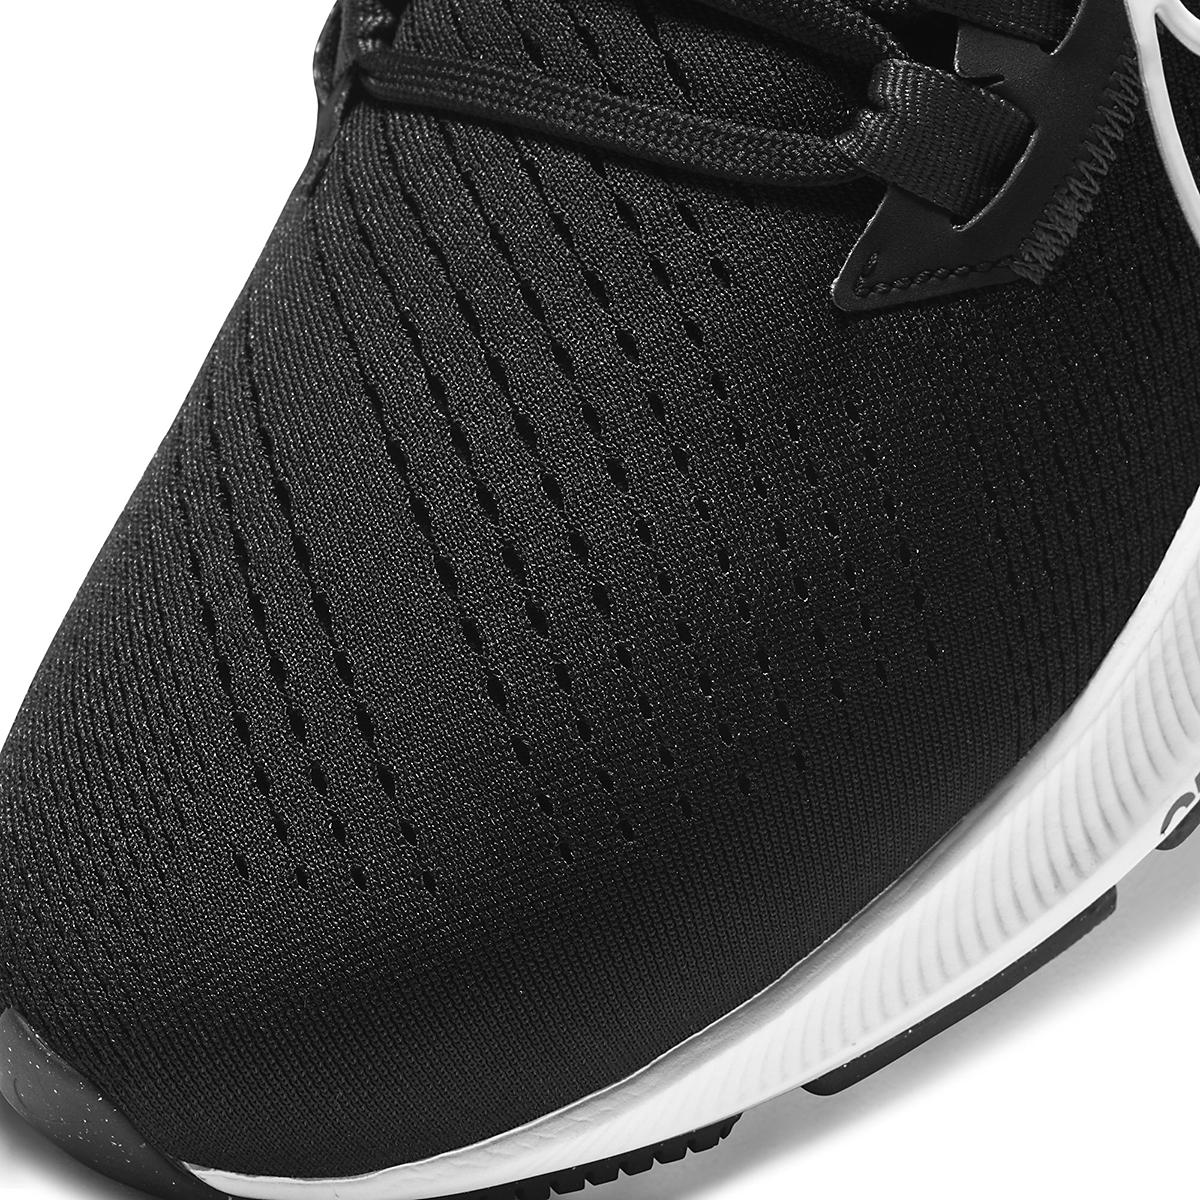 Men's Nike Air Zoom Pegasus 38 Running Shoe - Color: Black/White/Anthracite - Size: 6 - Width: Regular, Black/White/Anthracite, large, image 3